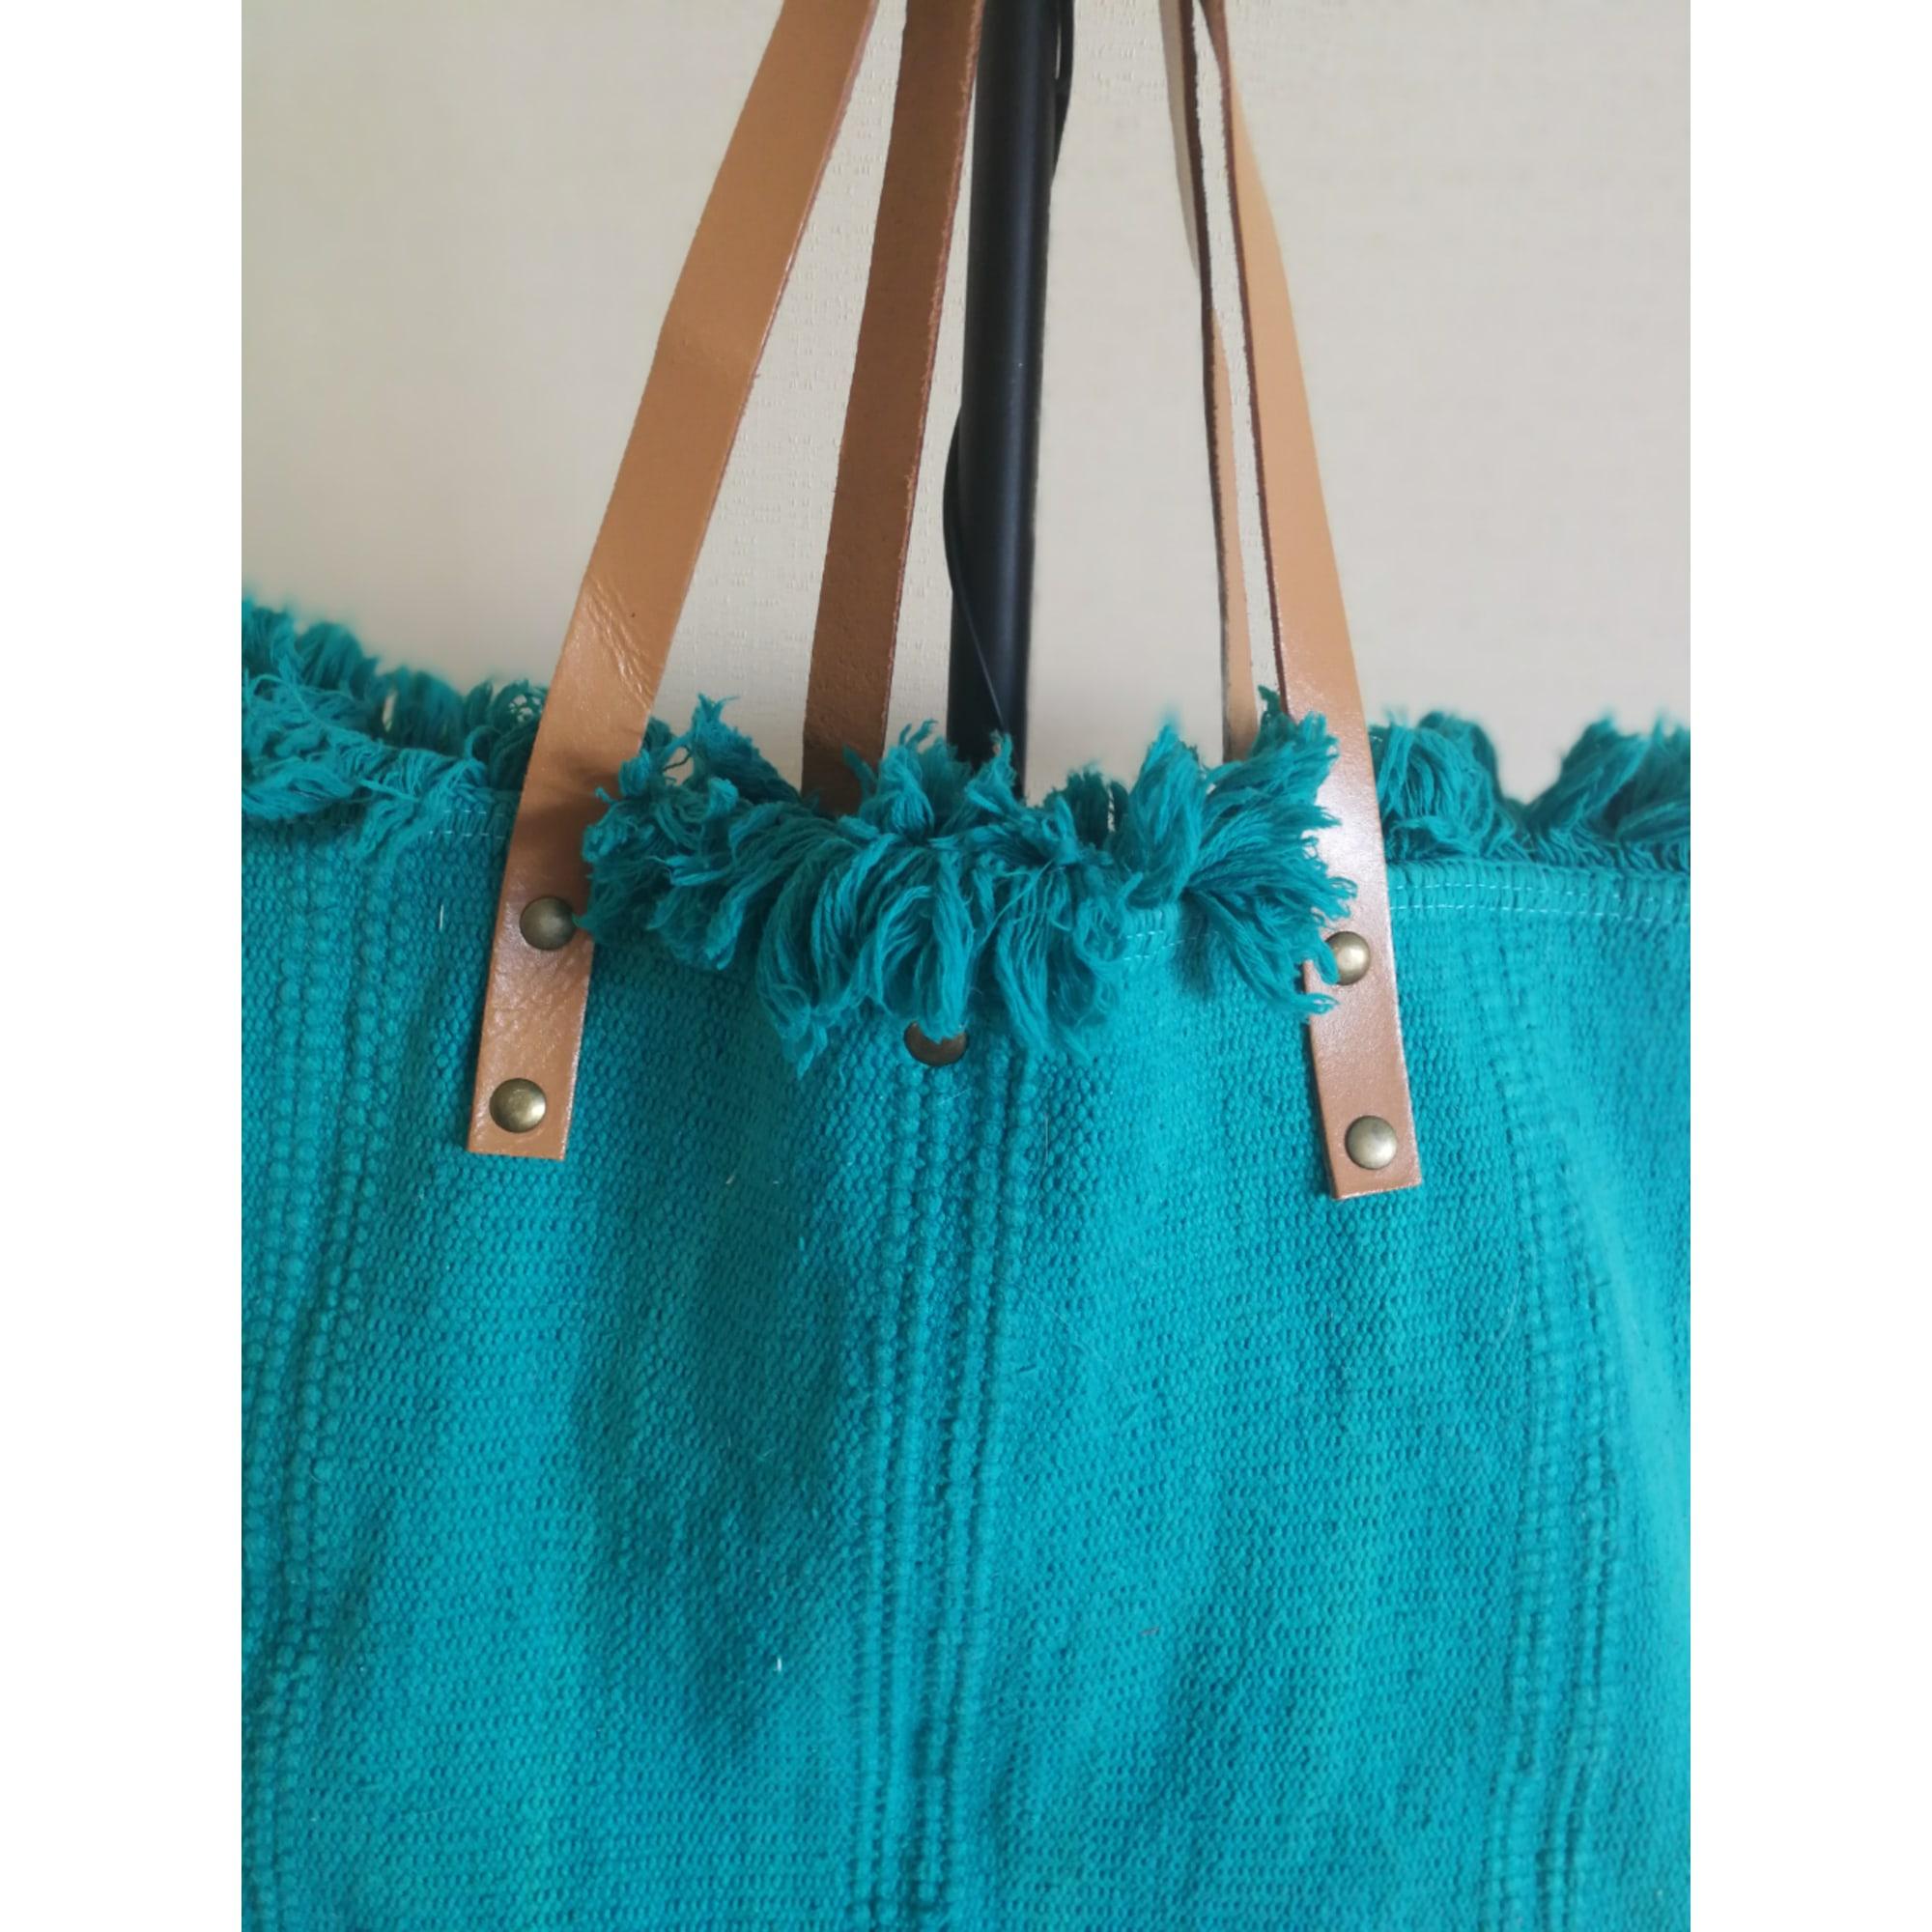 Sac XL en tissu AUTRES Bleu, bleu marine, bleu turquoise